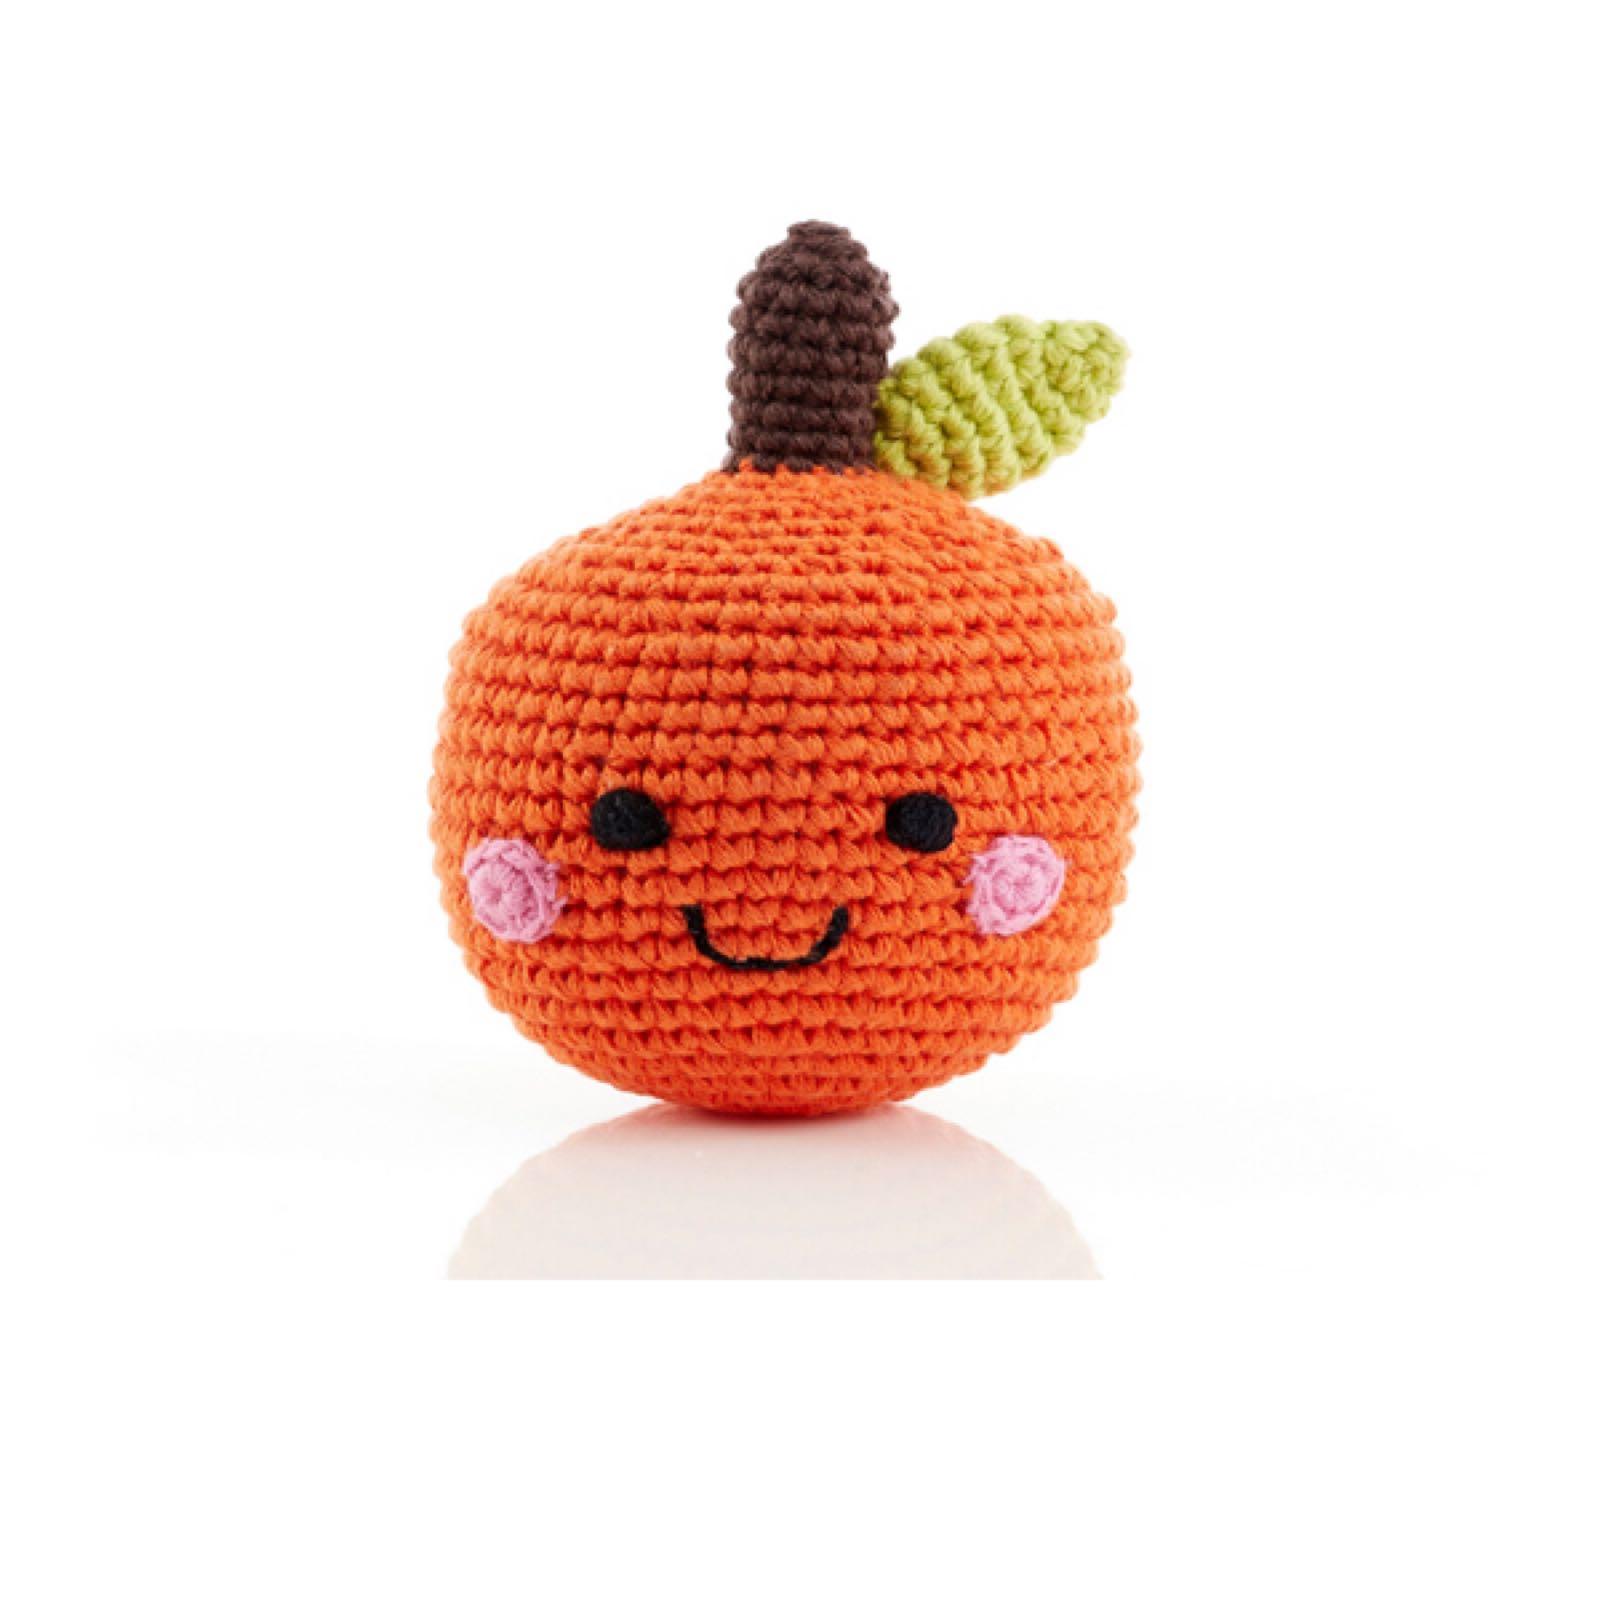 Pebble - Crochet cotton rattle - Orange